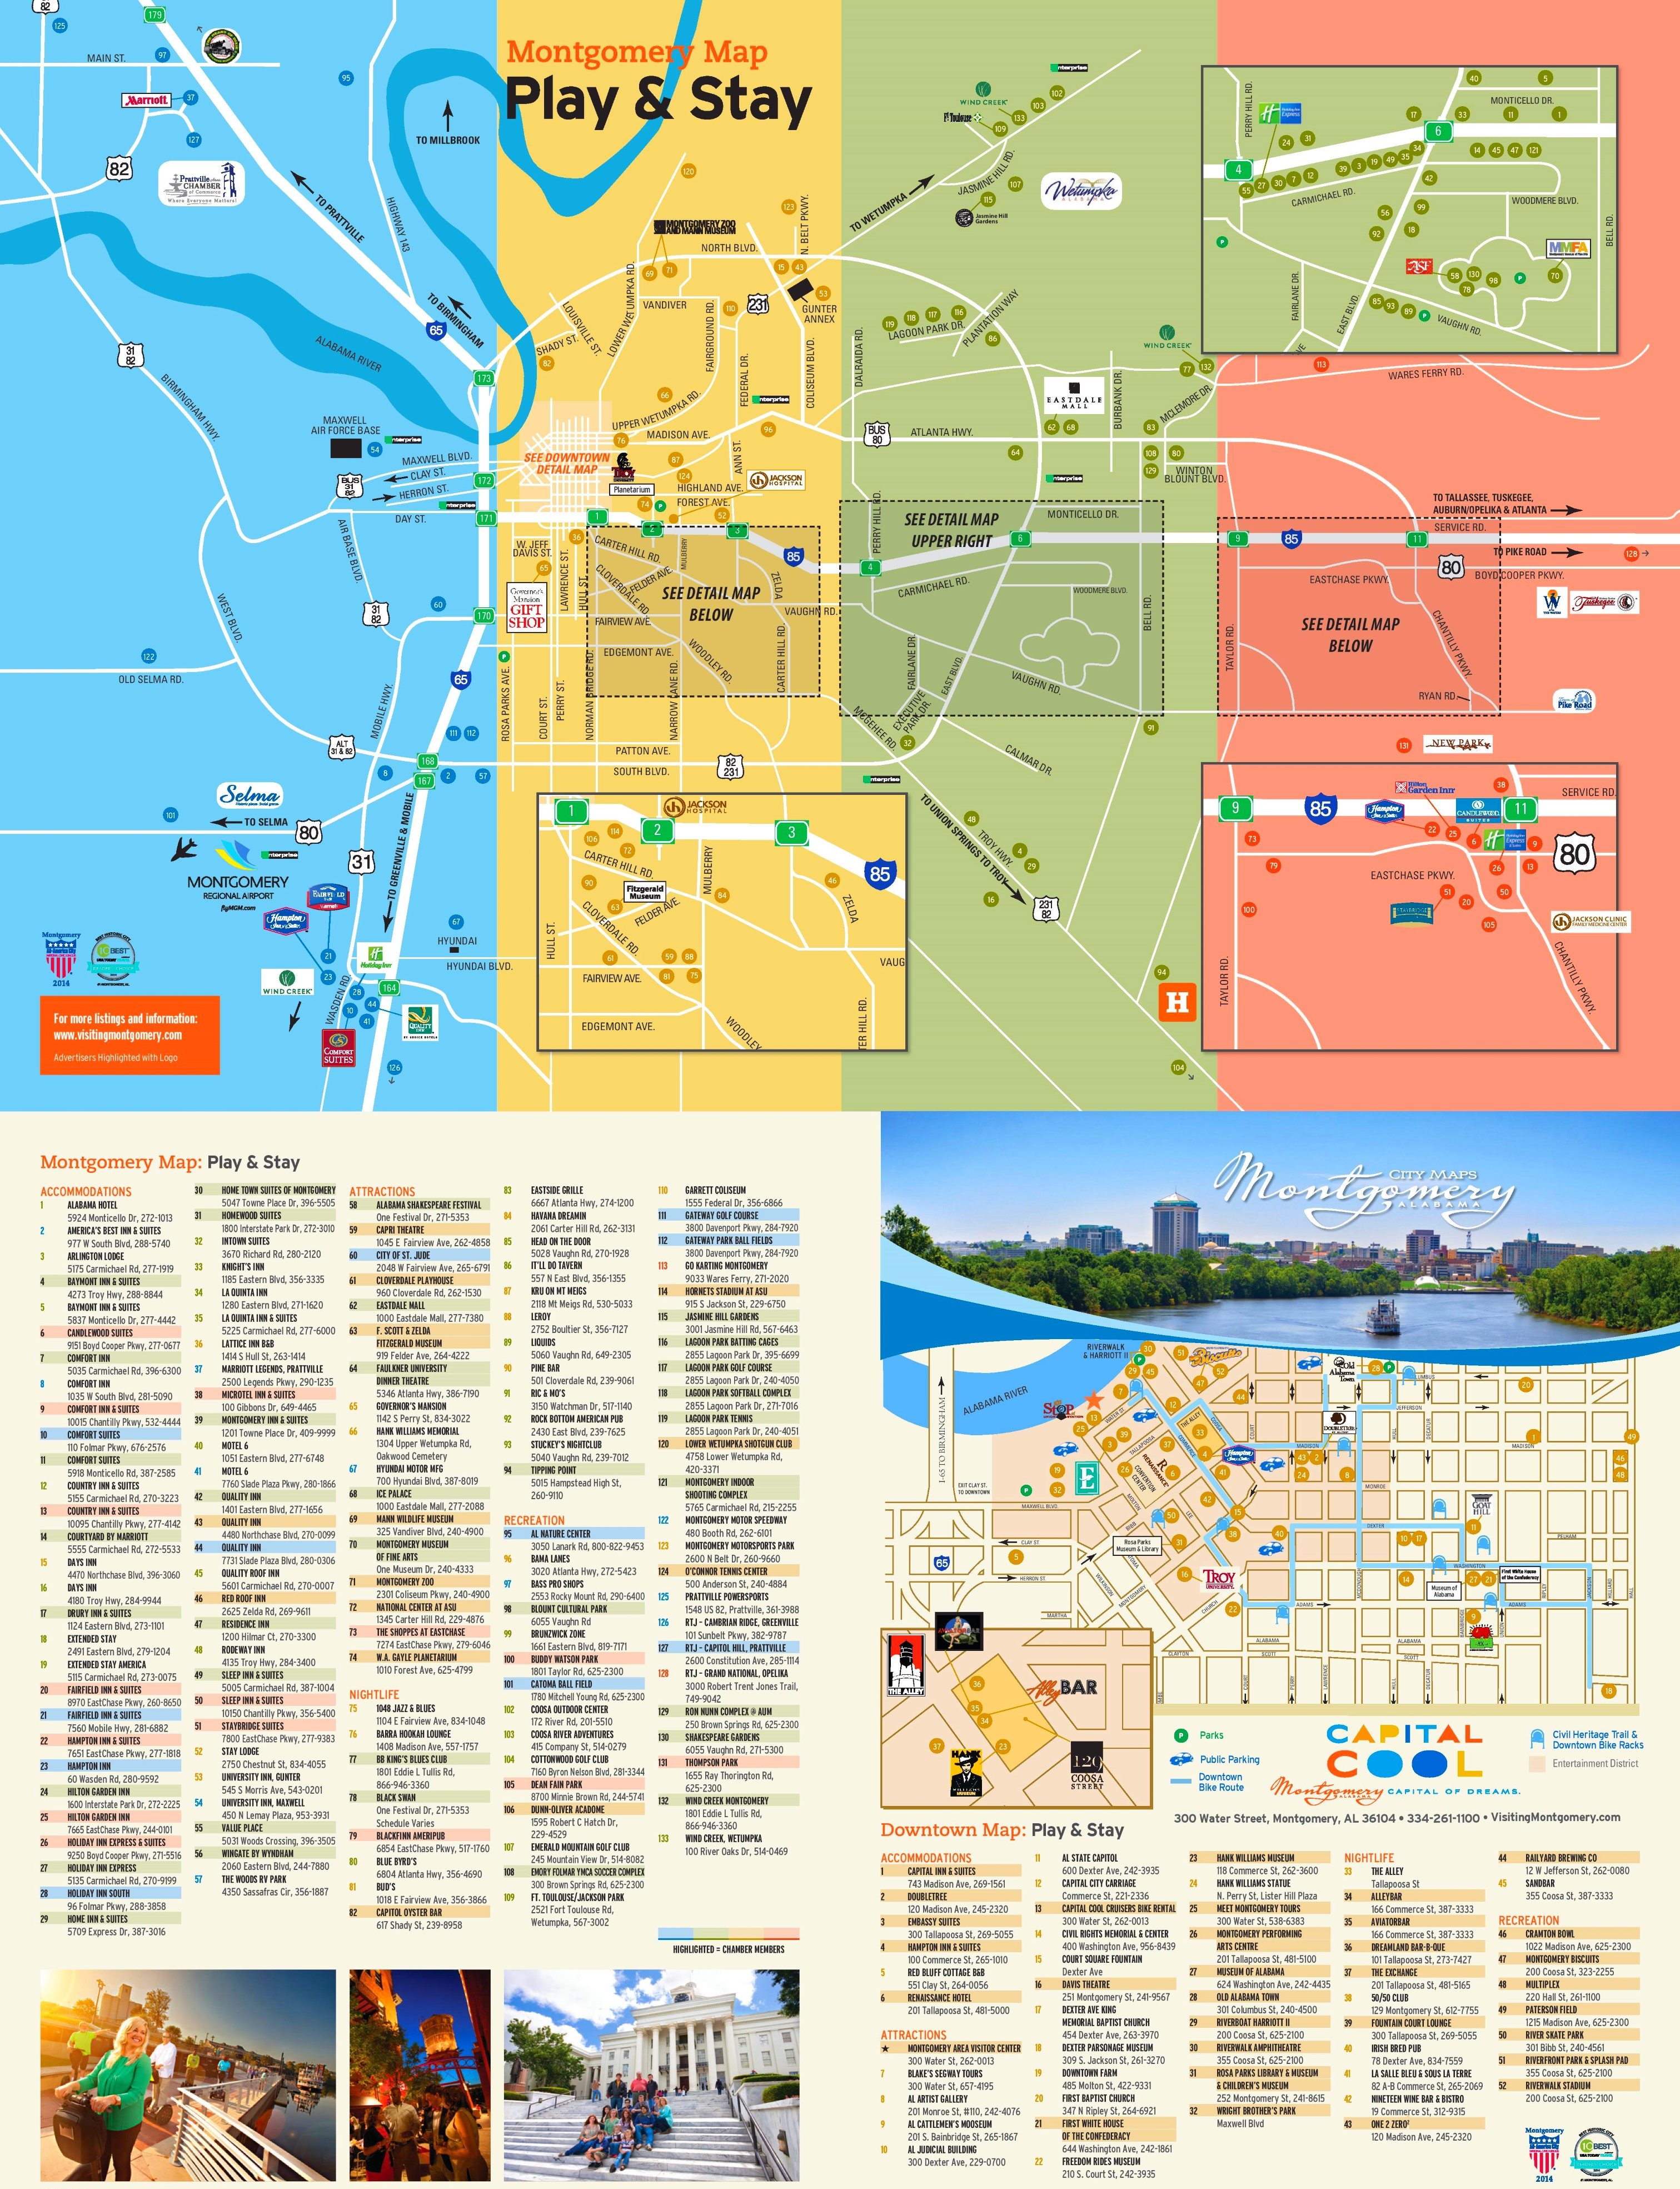 Montgomery hotels and sightseeings map on staples usa map, gary usa map, ottawa usa map, helena usa map, jacksonville usa map, chattanooga usa map, fort worth usa map, lexington usa map, franklin usa map, deep south usa map, wichita usa map, st. louis usa map, wilmington usa map, florence usa map, auburn usa map, birmingham usa map, vicksburg usa map, cheyenne usa map, tucson usa map, omaha usa map,